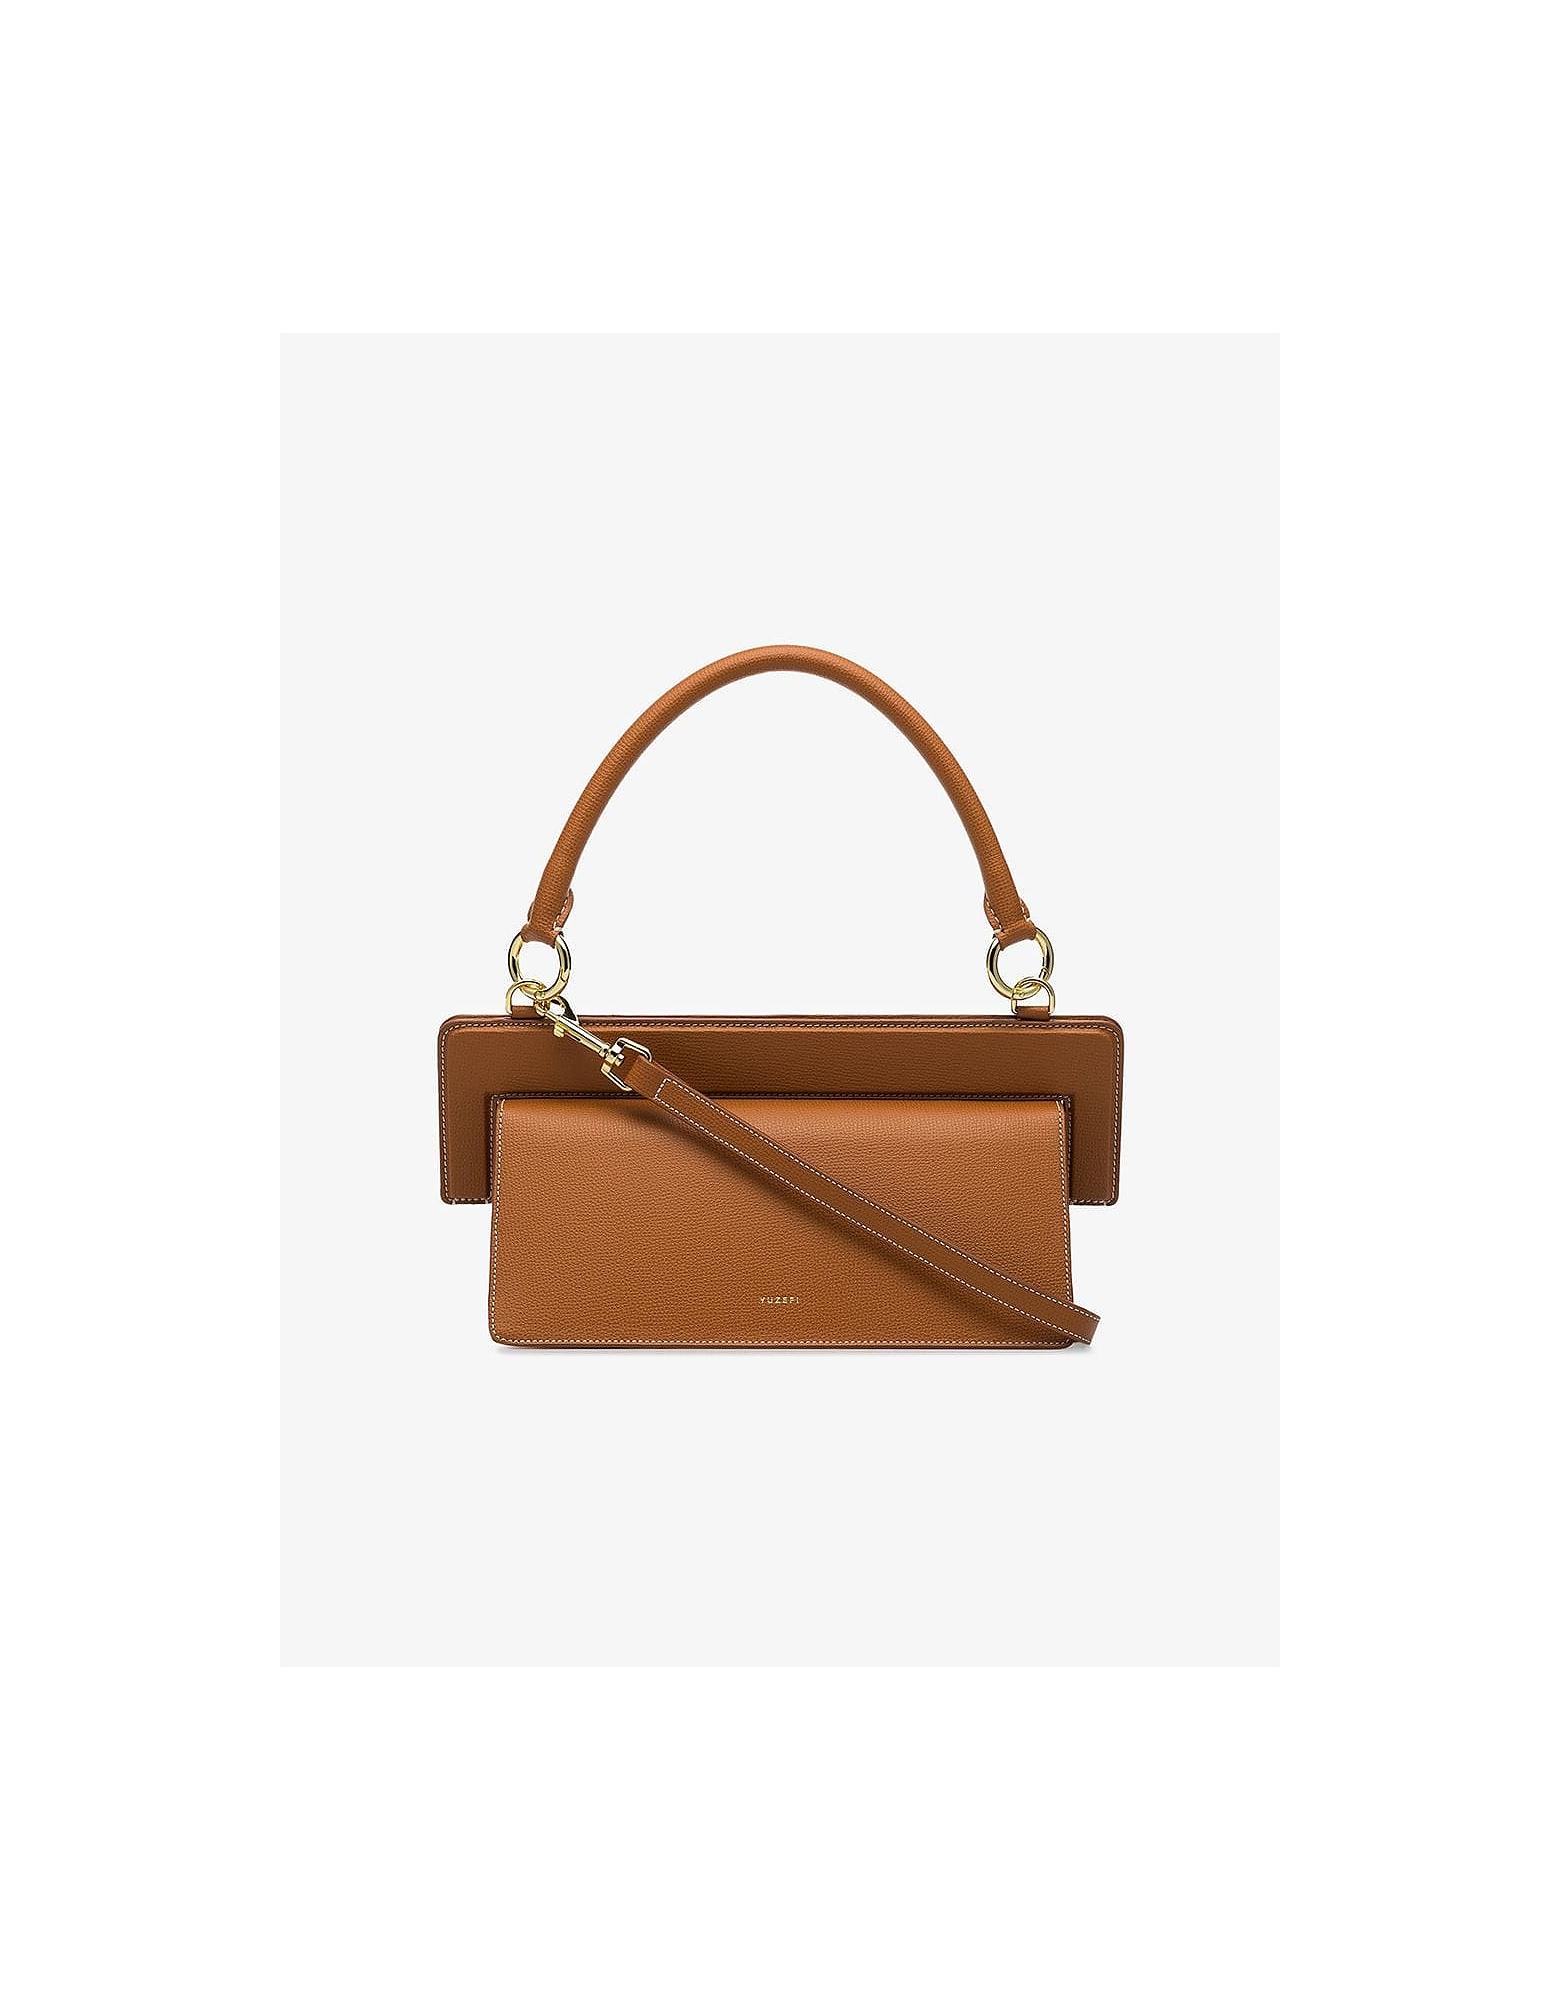 Yuzefi Designer Handbags, Brown Ada Leather Shoulder Bag